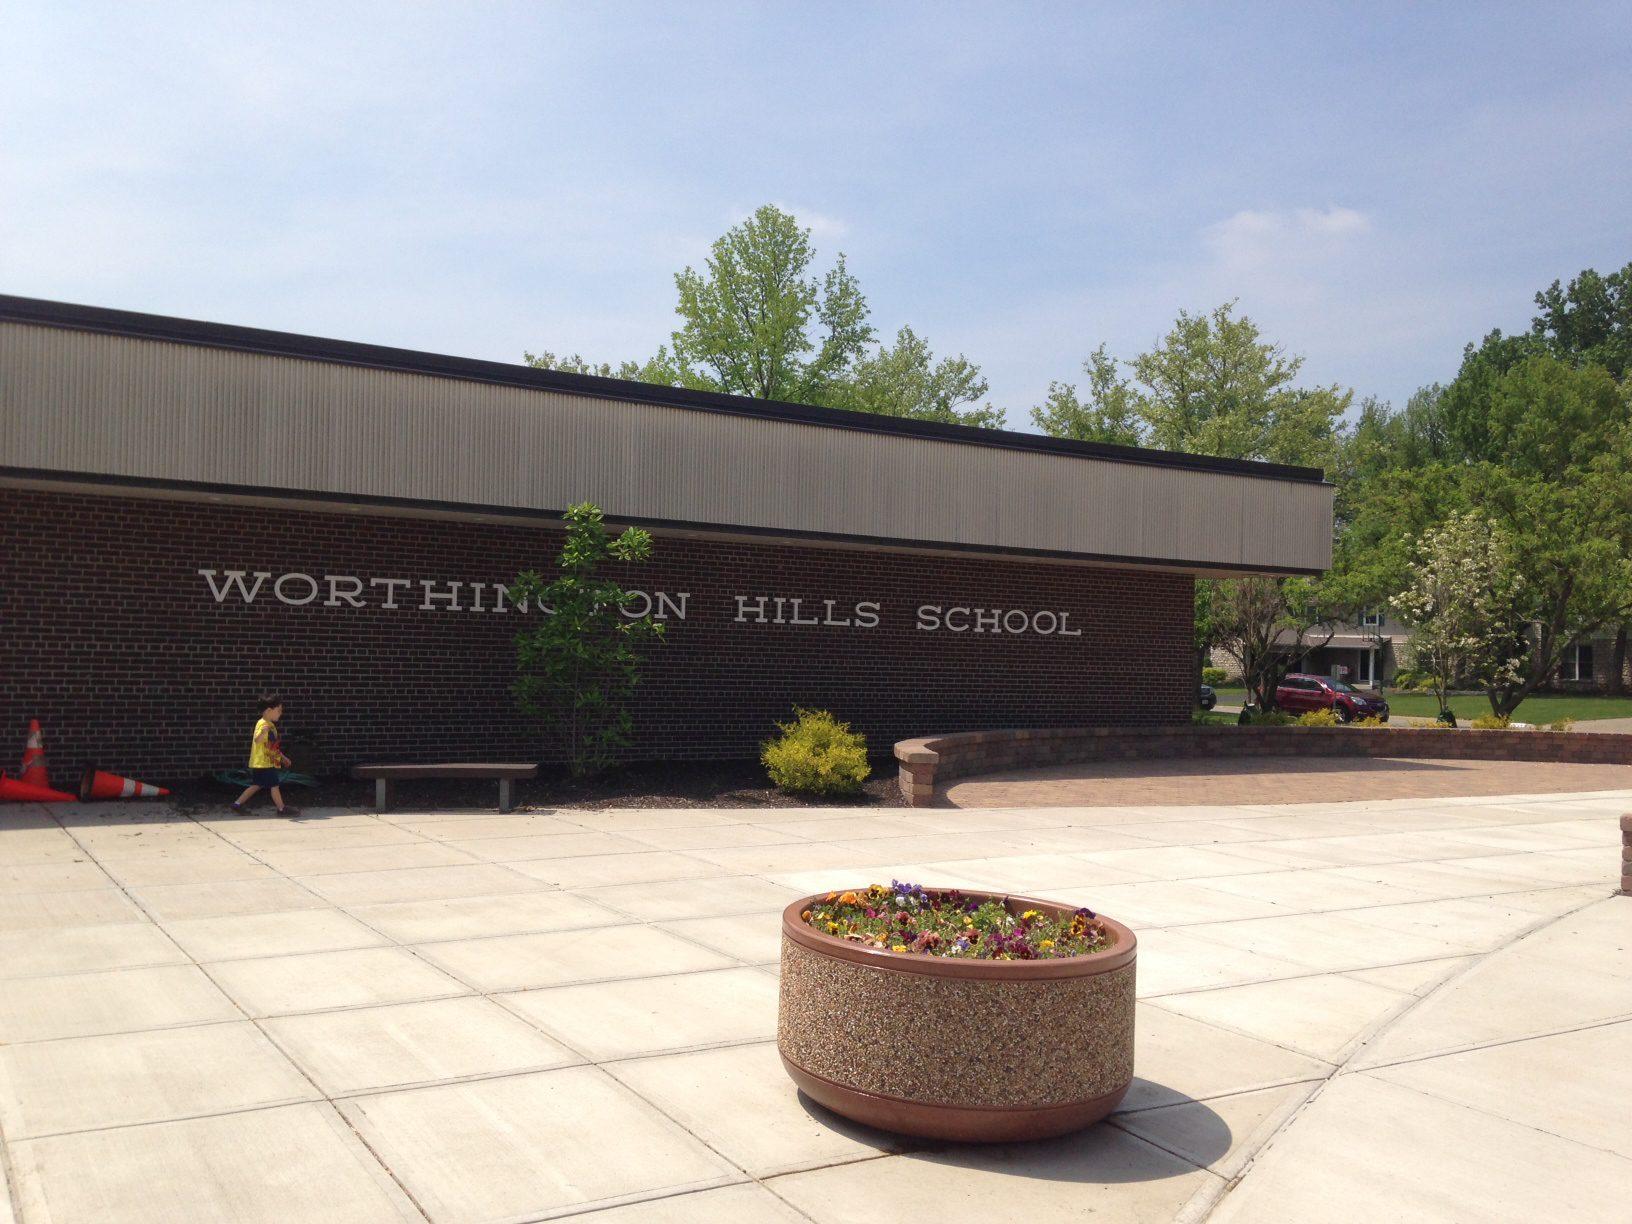 Worthington Hills Elementary School